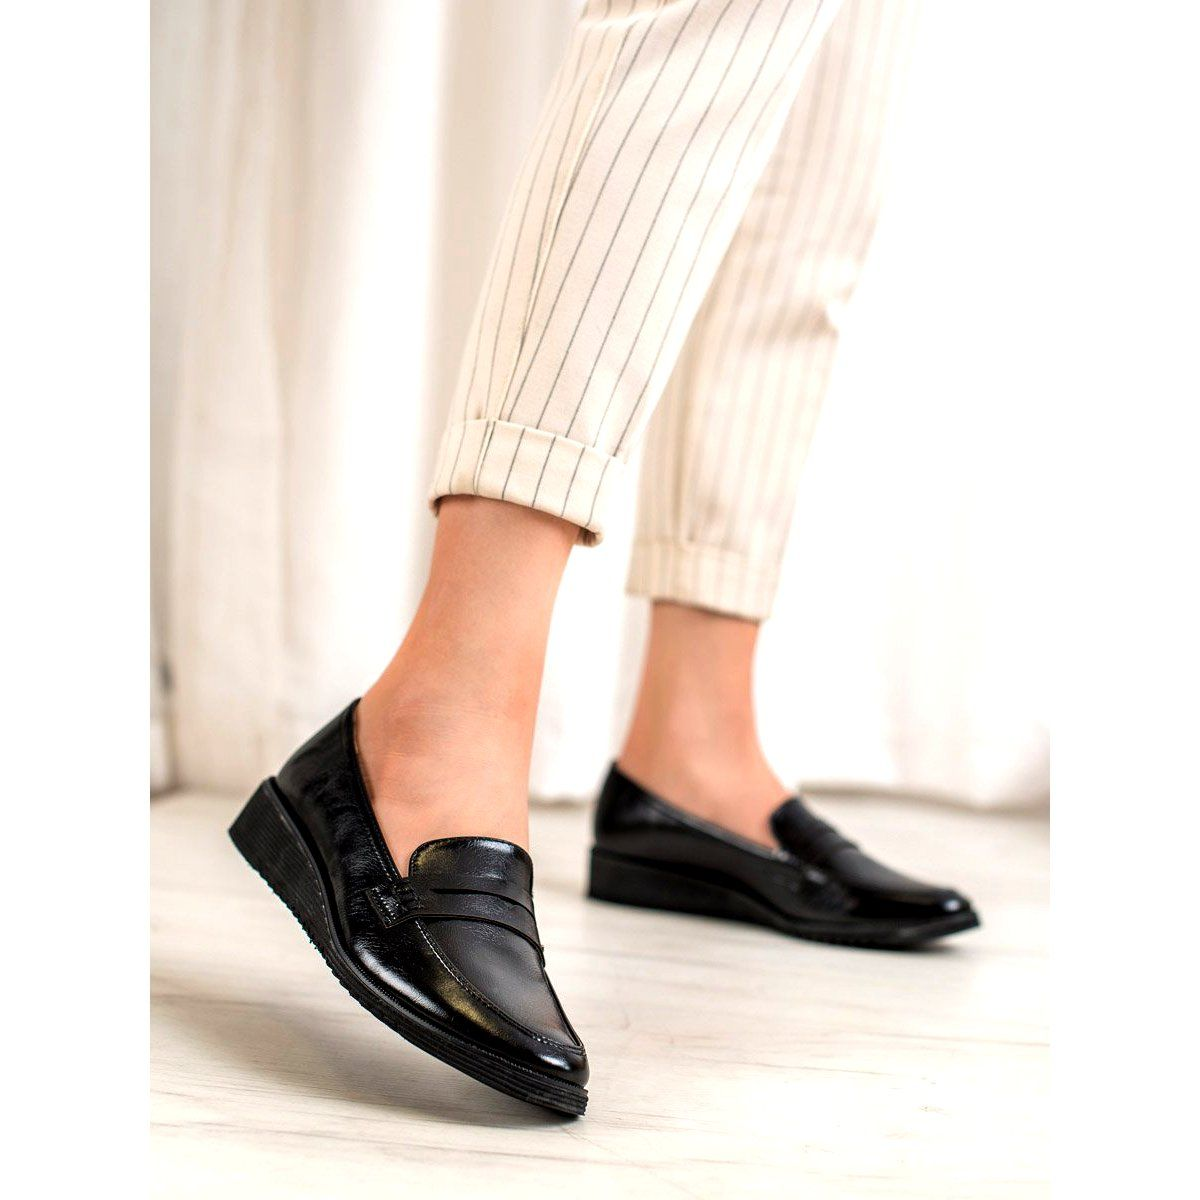 Goodin Czarne Mokasyny Na Koturnie Shoes Loafers Mule Shoe